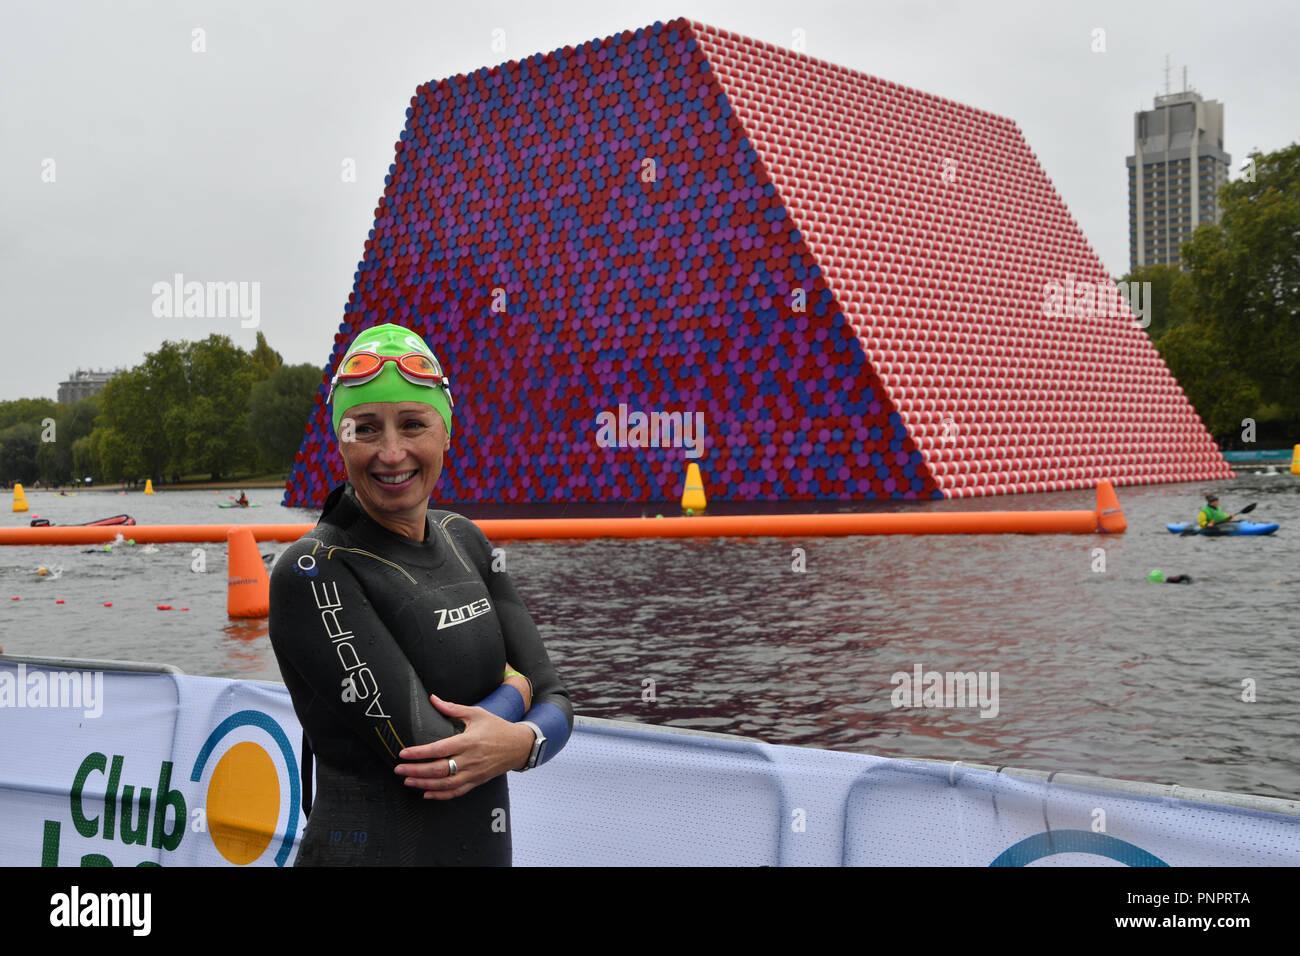 London, UK, 22nd September 2018Thousands participle Swim Serpentine 2018, London, UK. 22 September 2018. Credit: Picture Capital/Alamy Live News - Stock Image